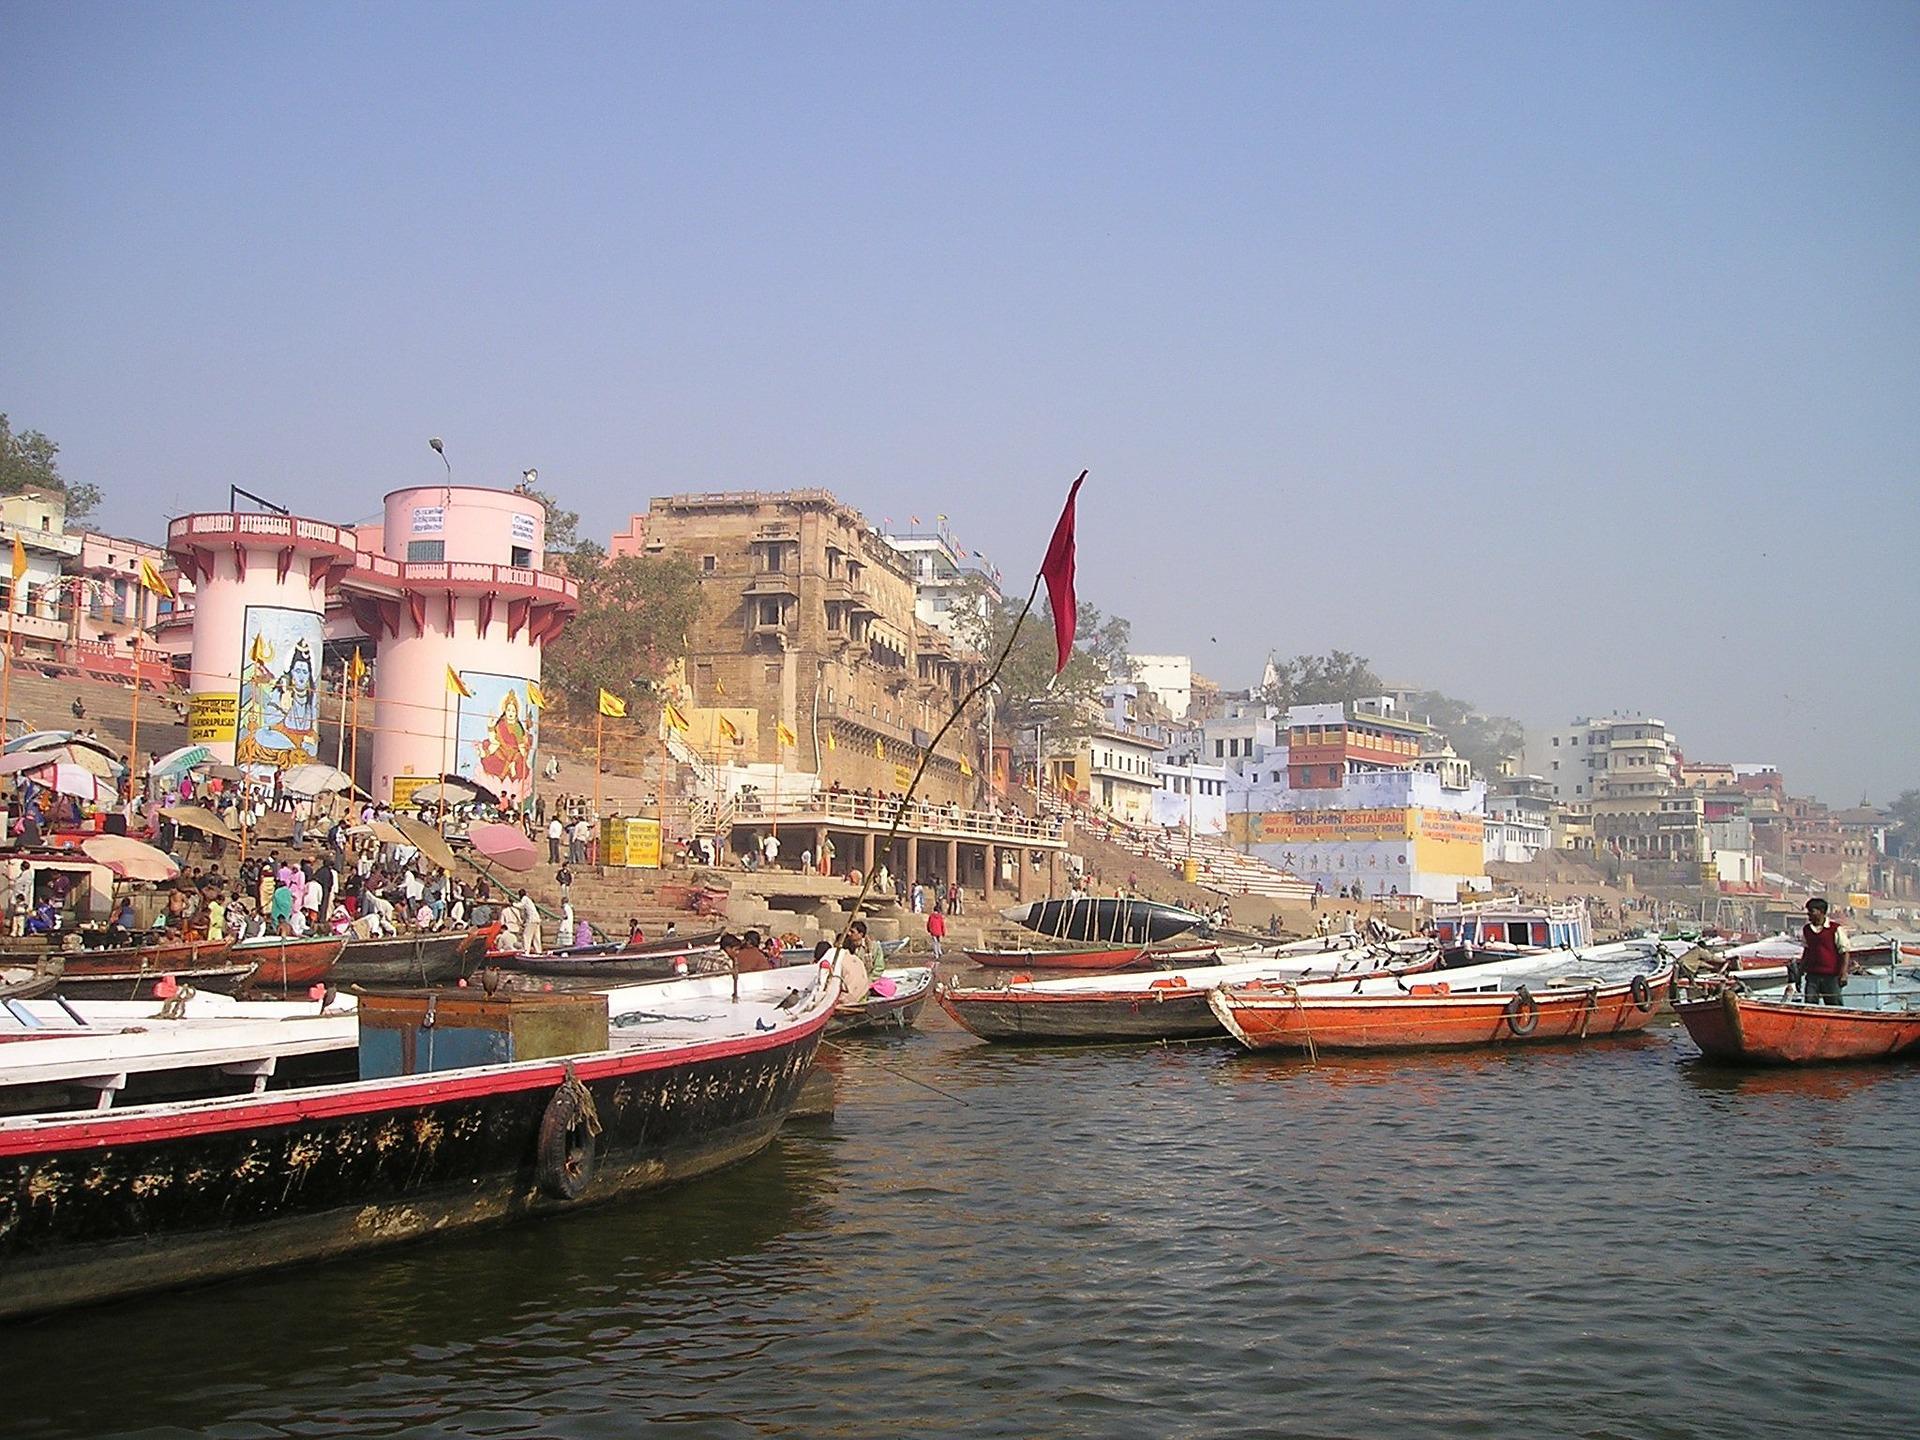 Ganga Banaras varanasi